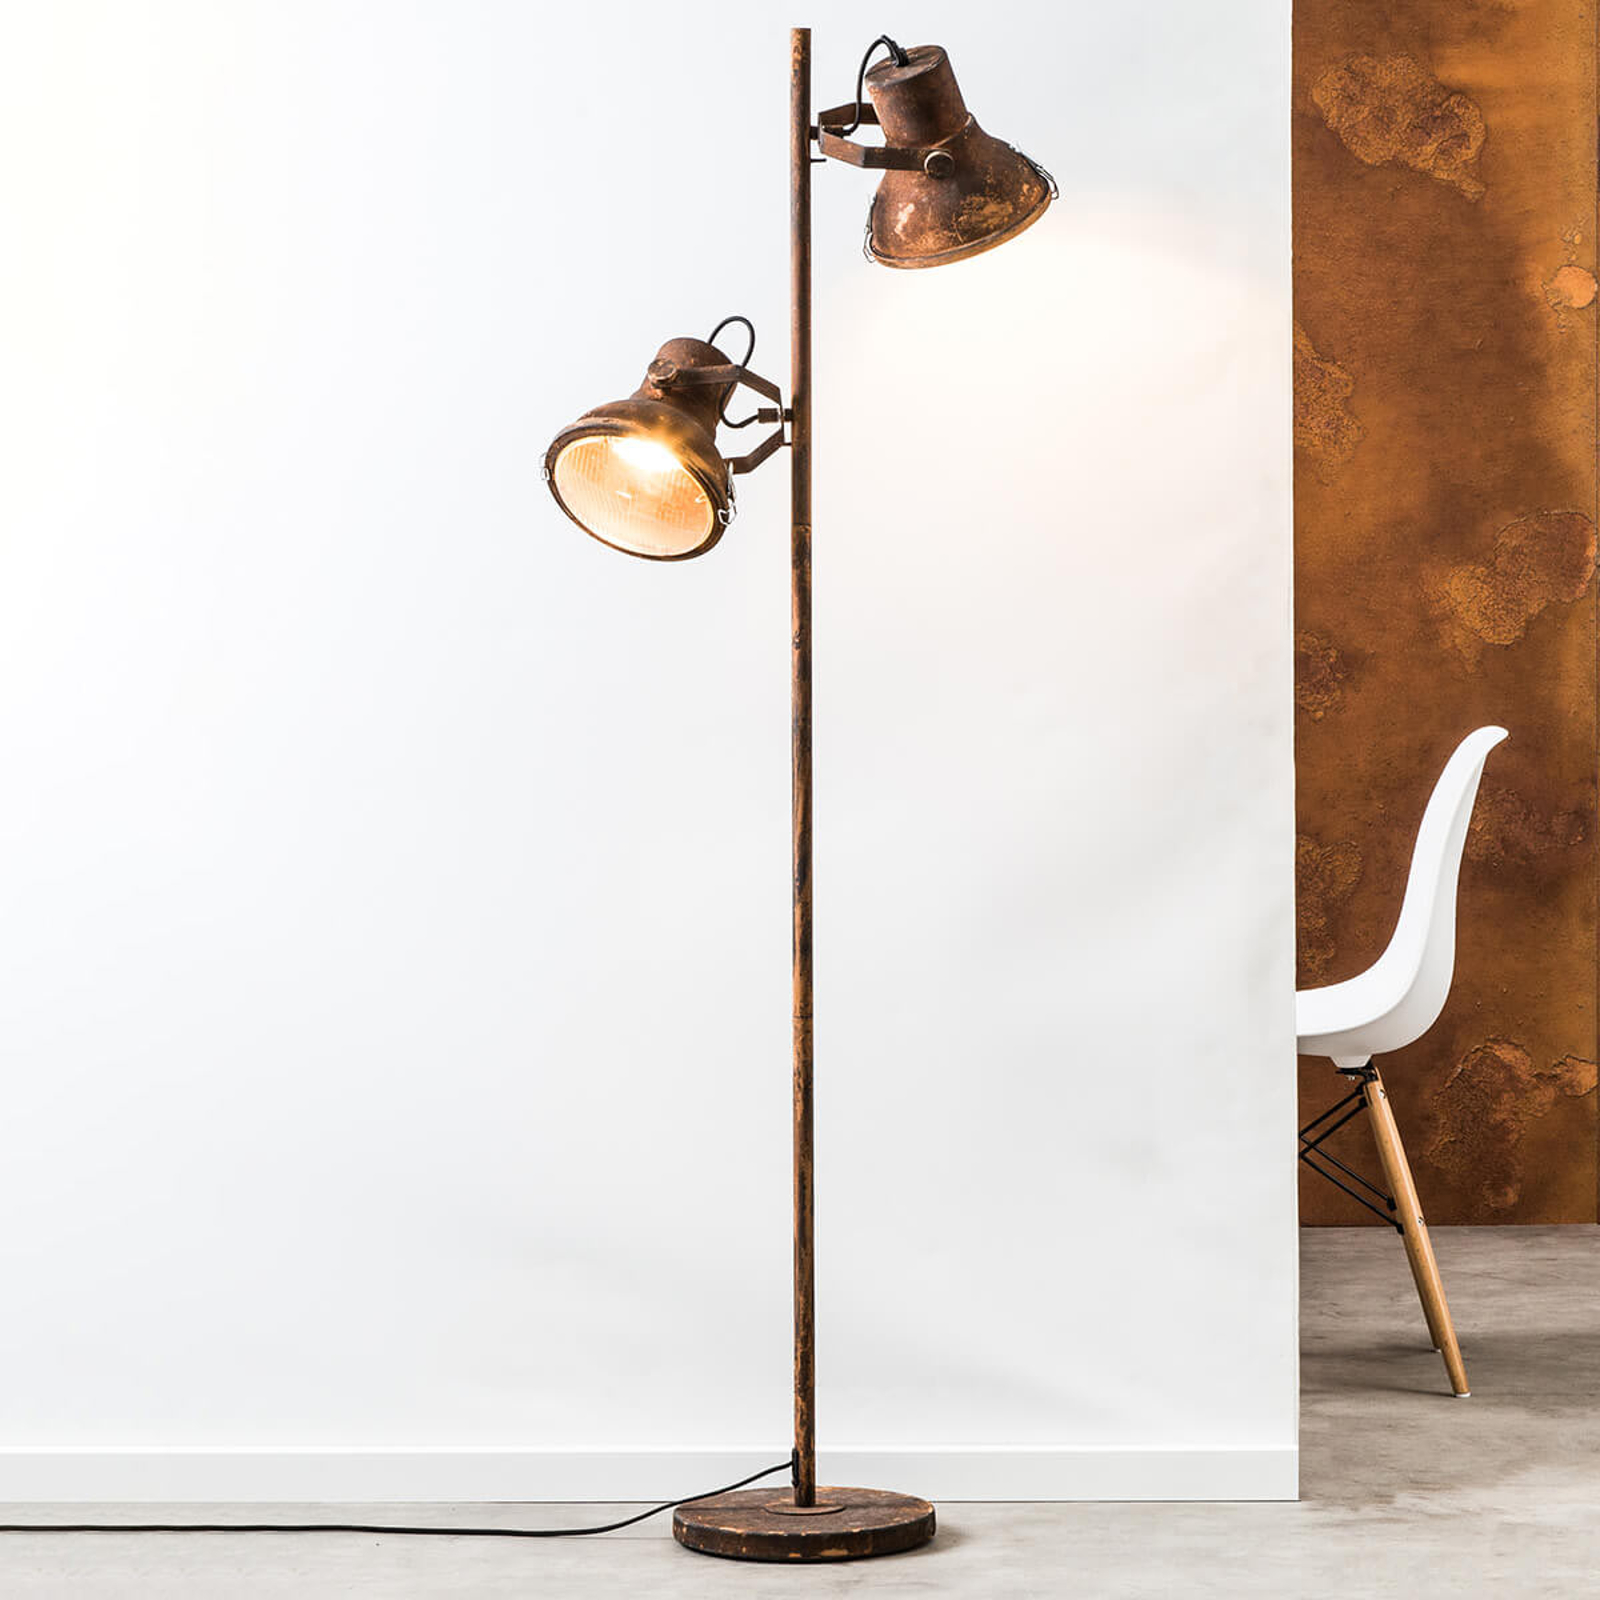 2-Punktowa lampa stojąca Frodo